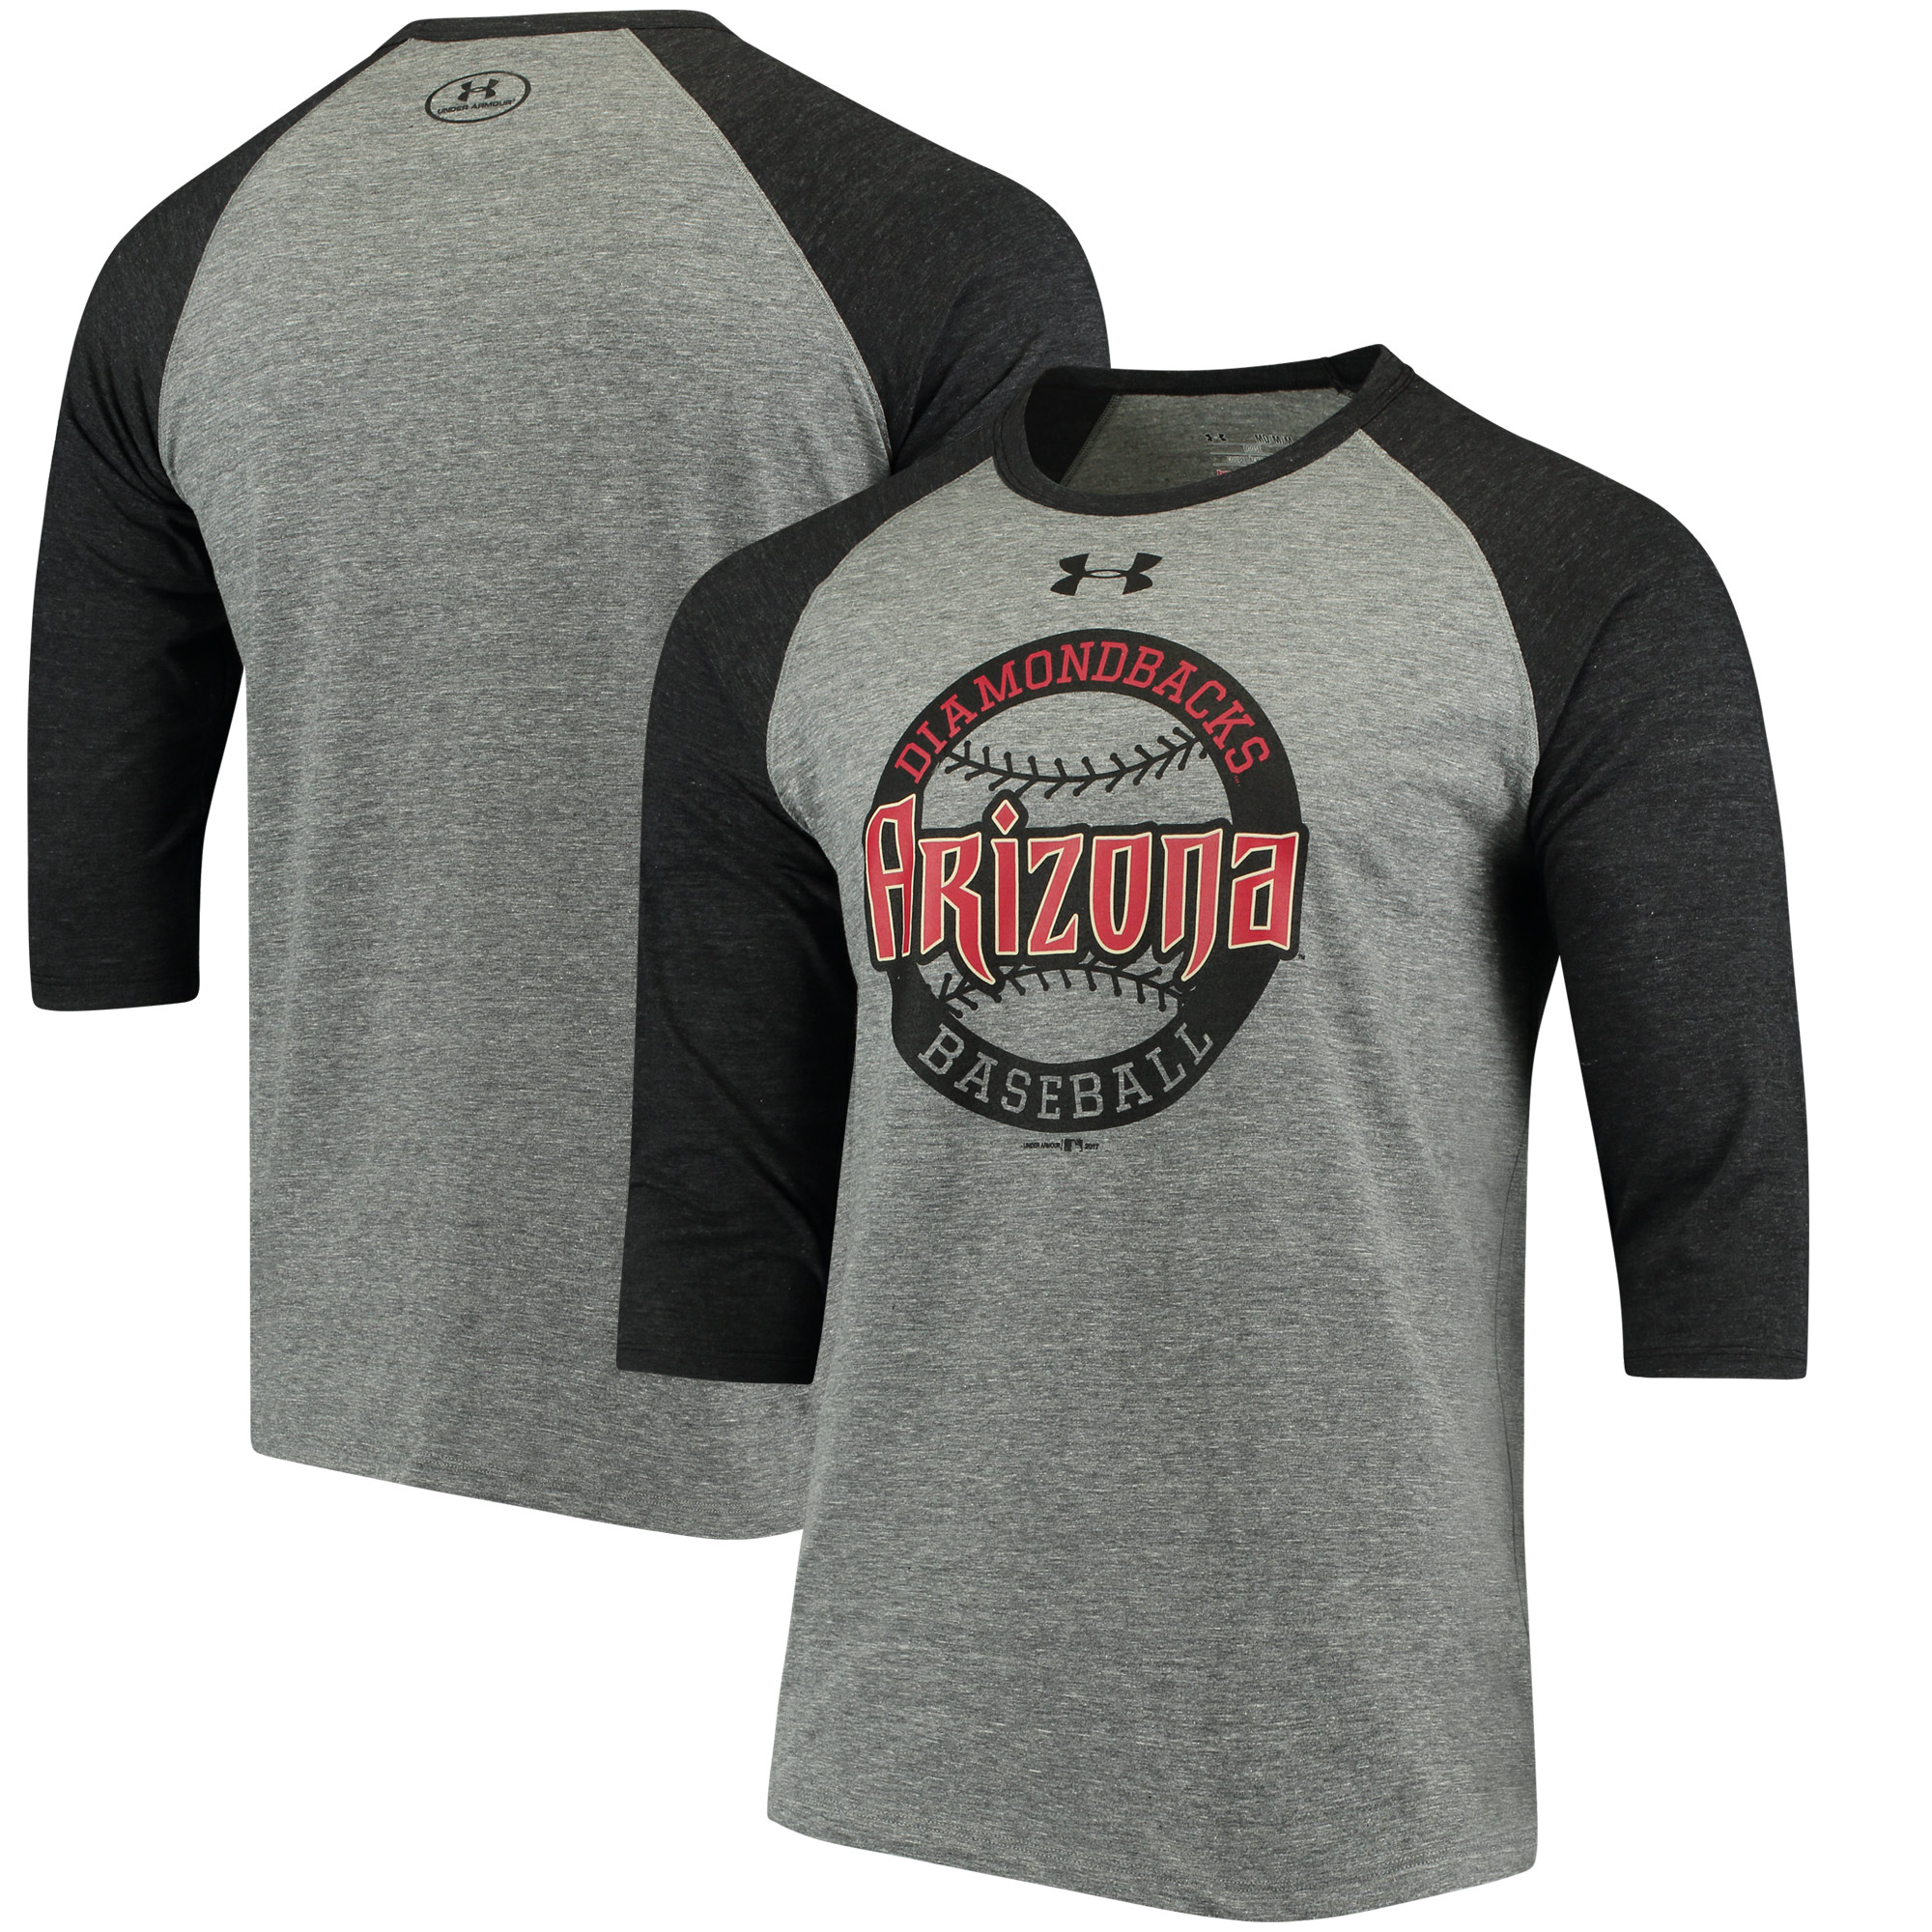 Arizona Diamondbacks Under Armour Baseball 3/4-Sleeve Tri-Blend T-Shirt - Gray/Black